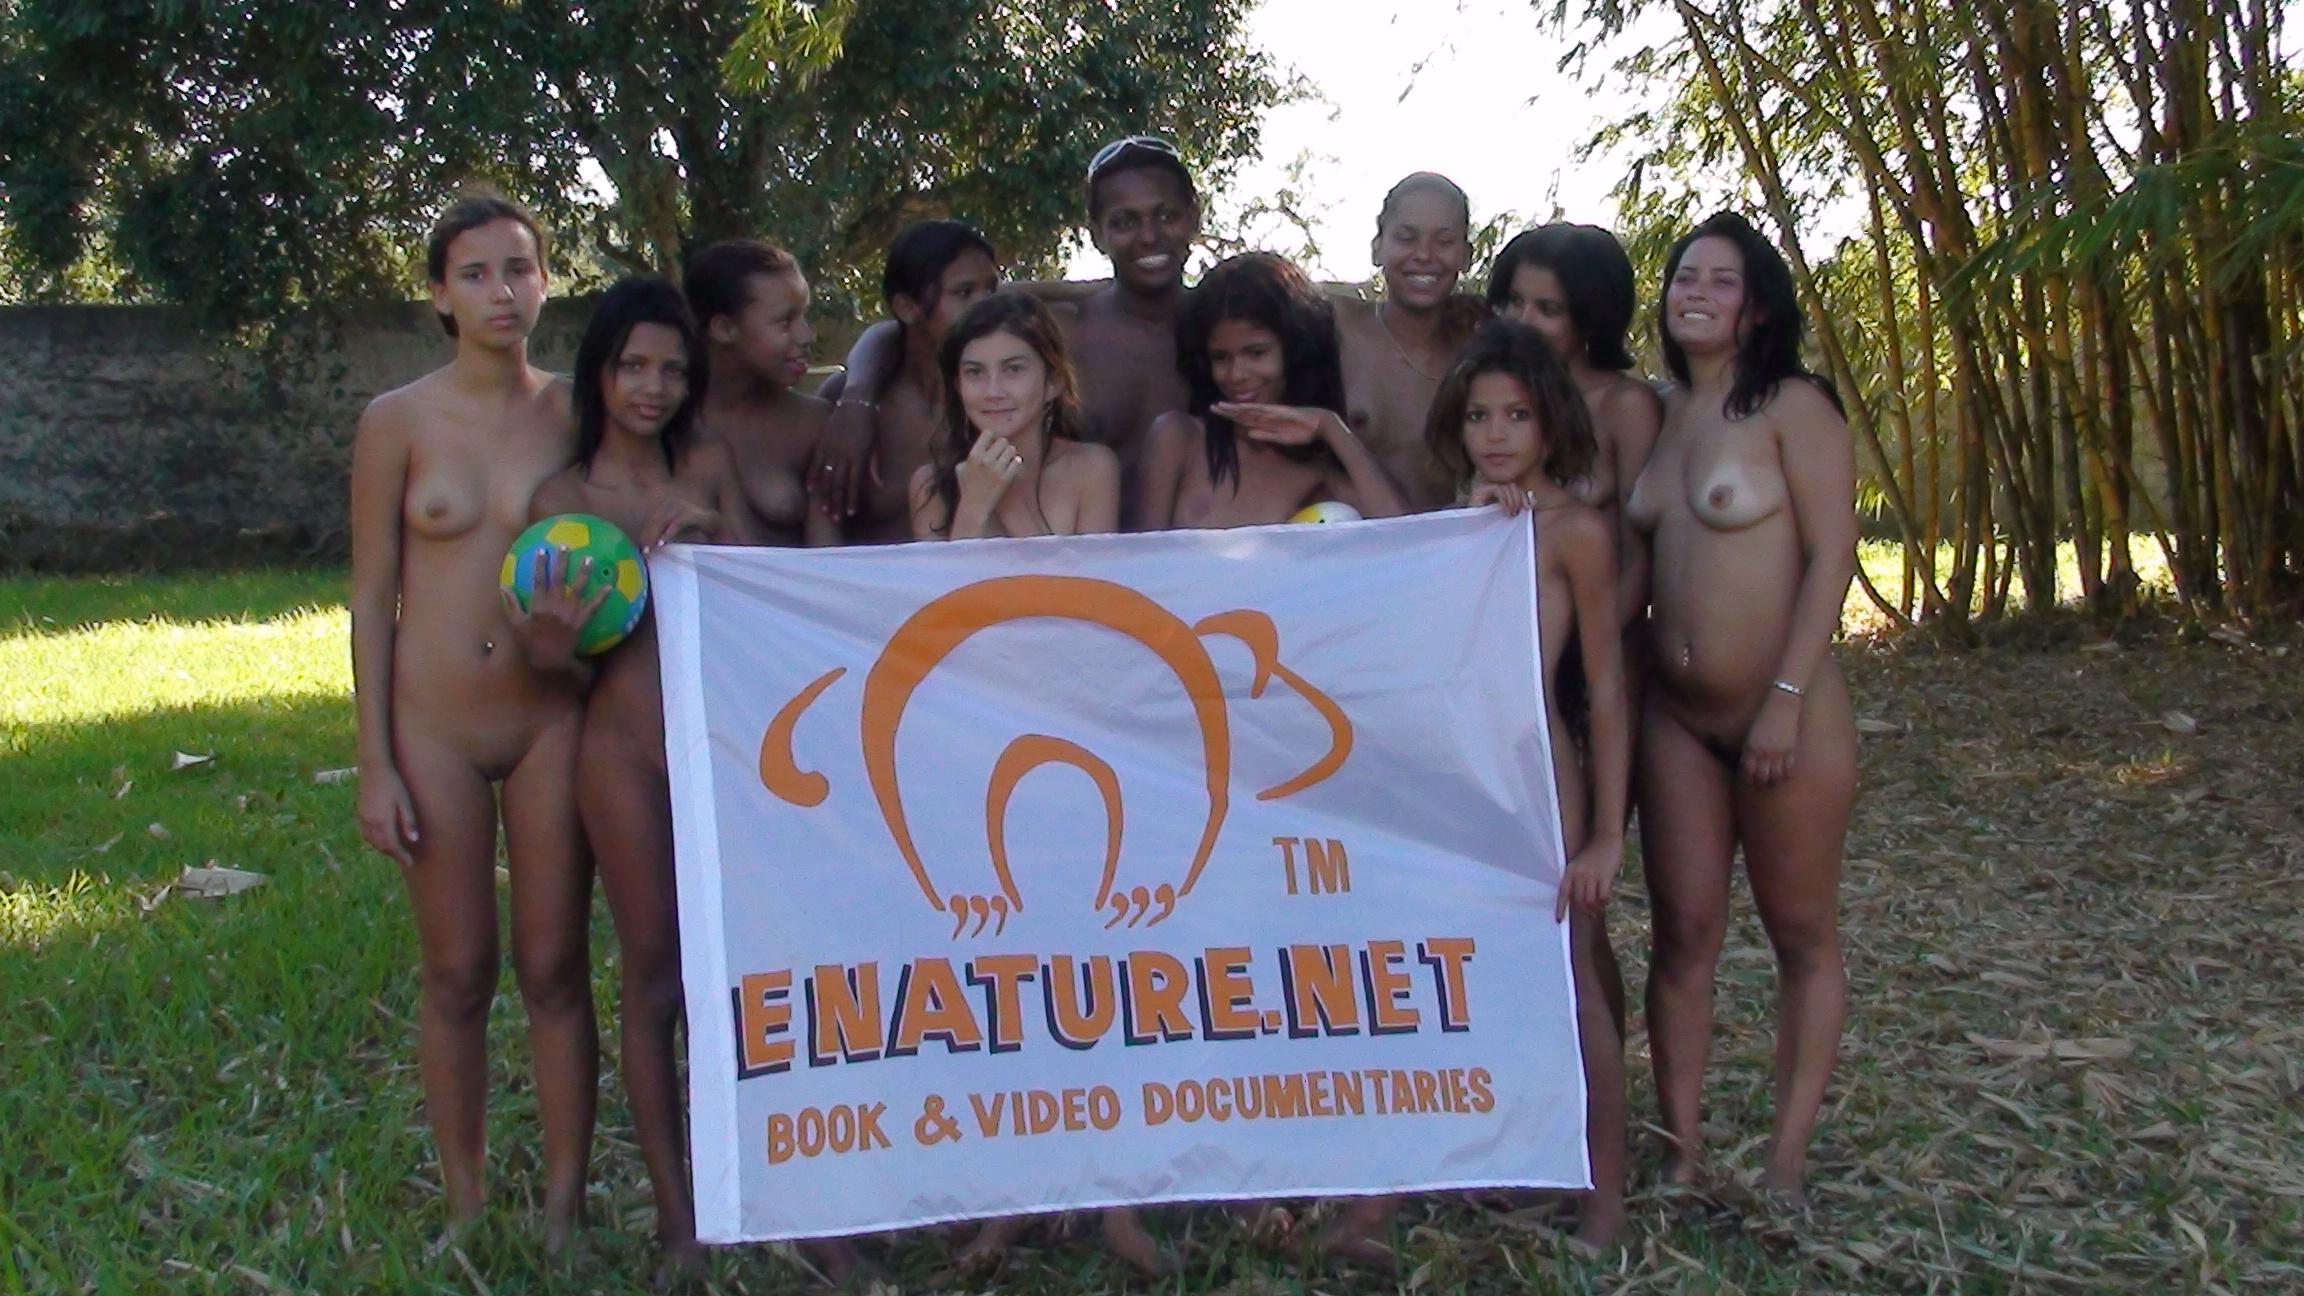 Free amateur interracial wwife porn